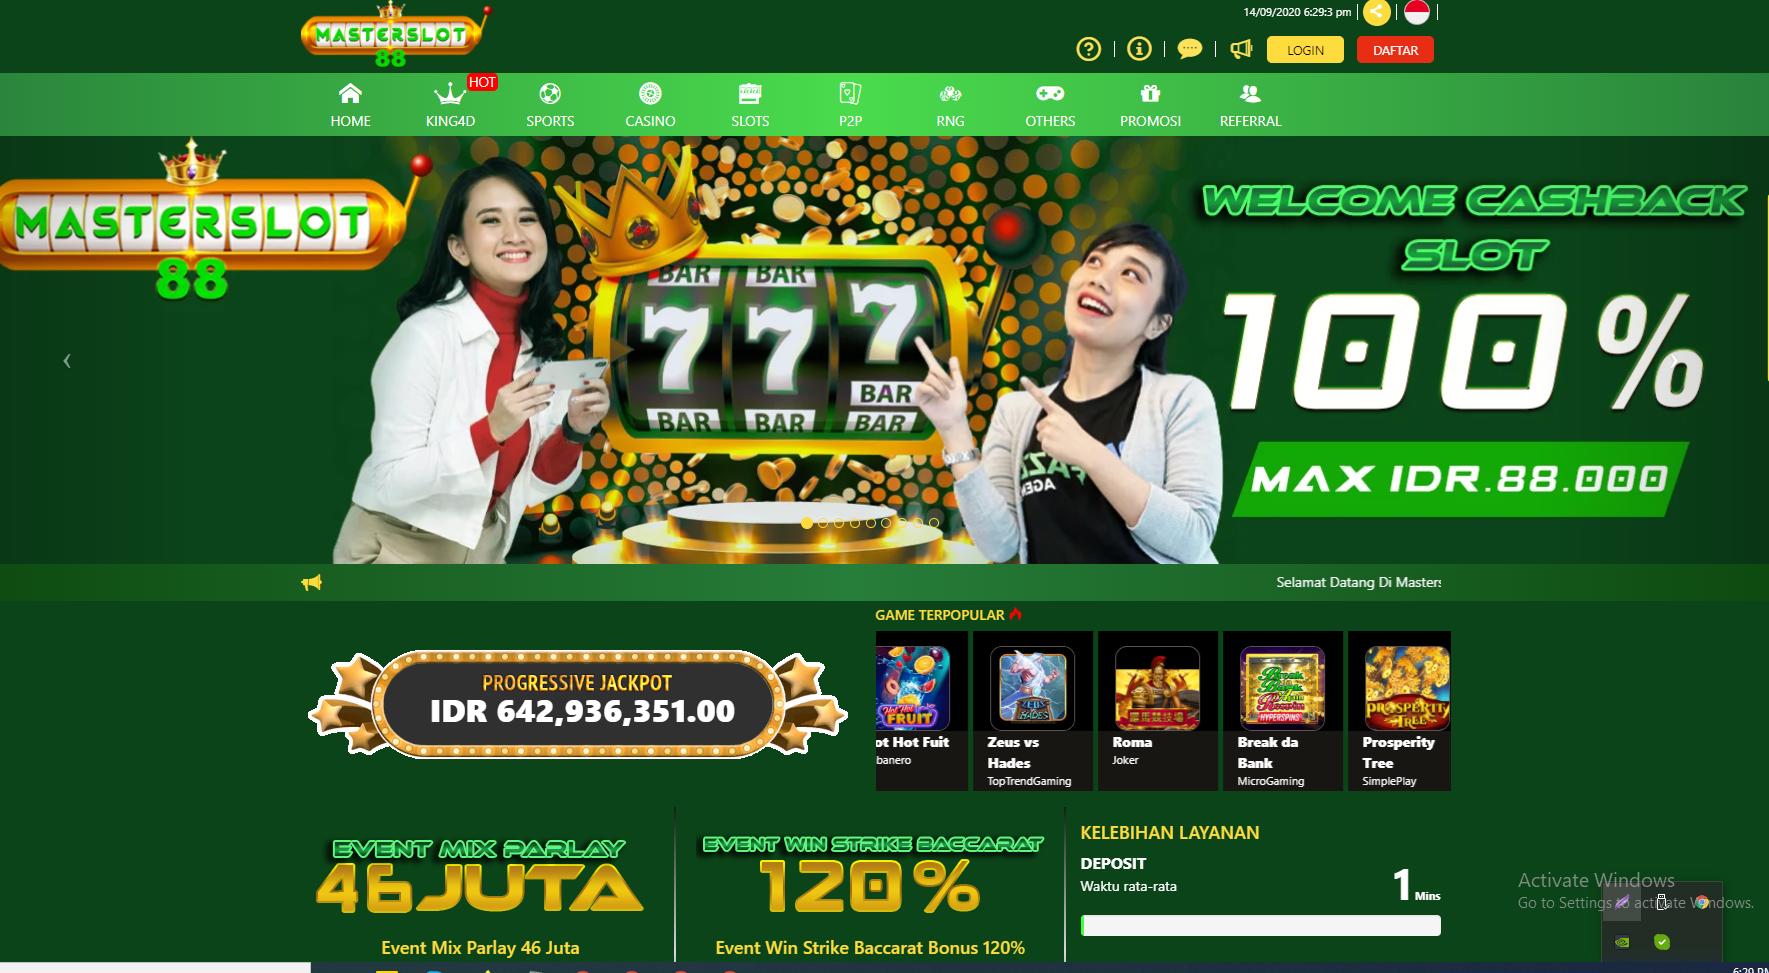 Masterslot88 Situs Daftar Judi Slot Aplikasi Linkaja Online 24 Jam Bathroom Designers In Jakarta Homify